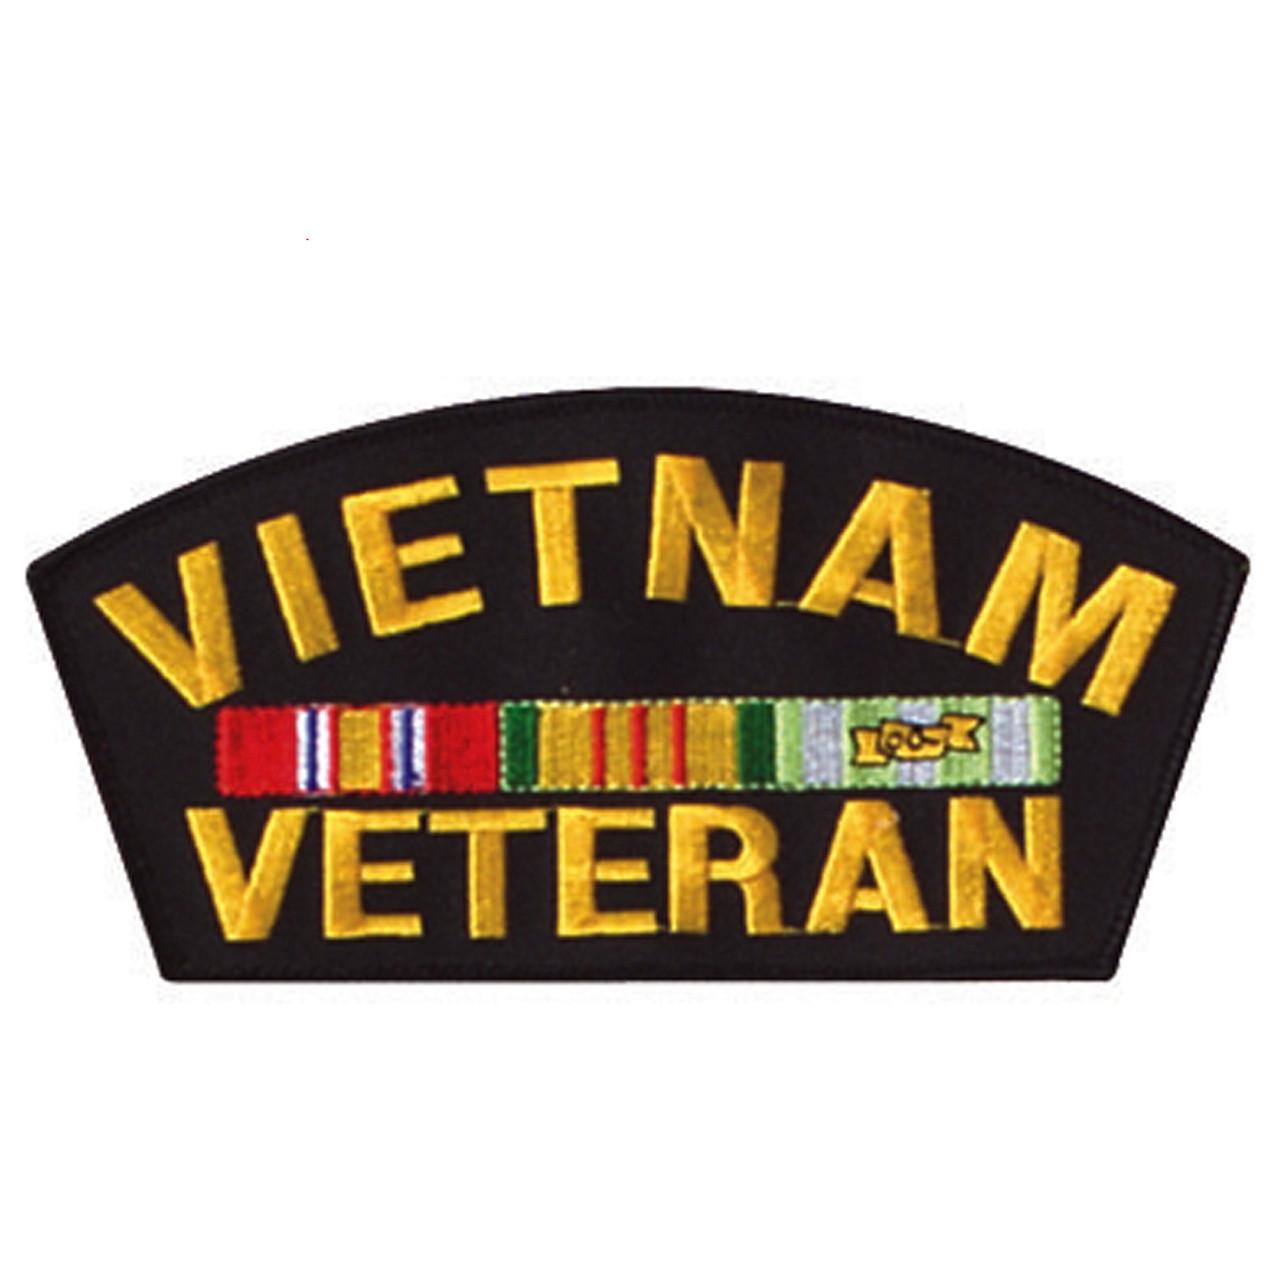 33b4bfbfa6b Shop Vietnam Veteran Patch - Fatigues Army Navy Gear